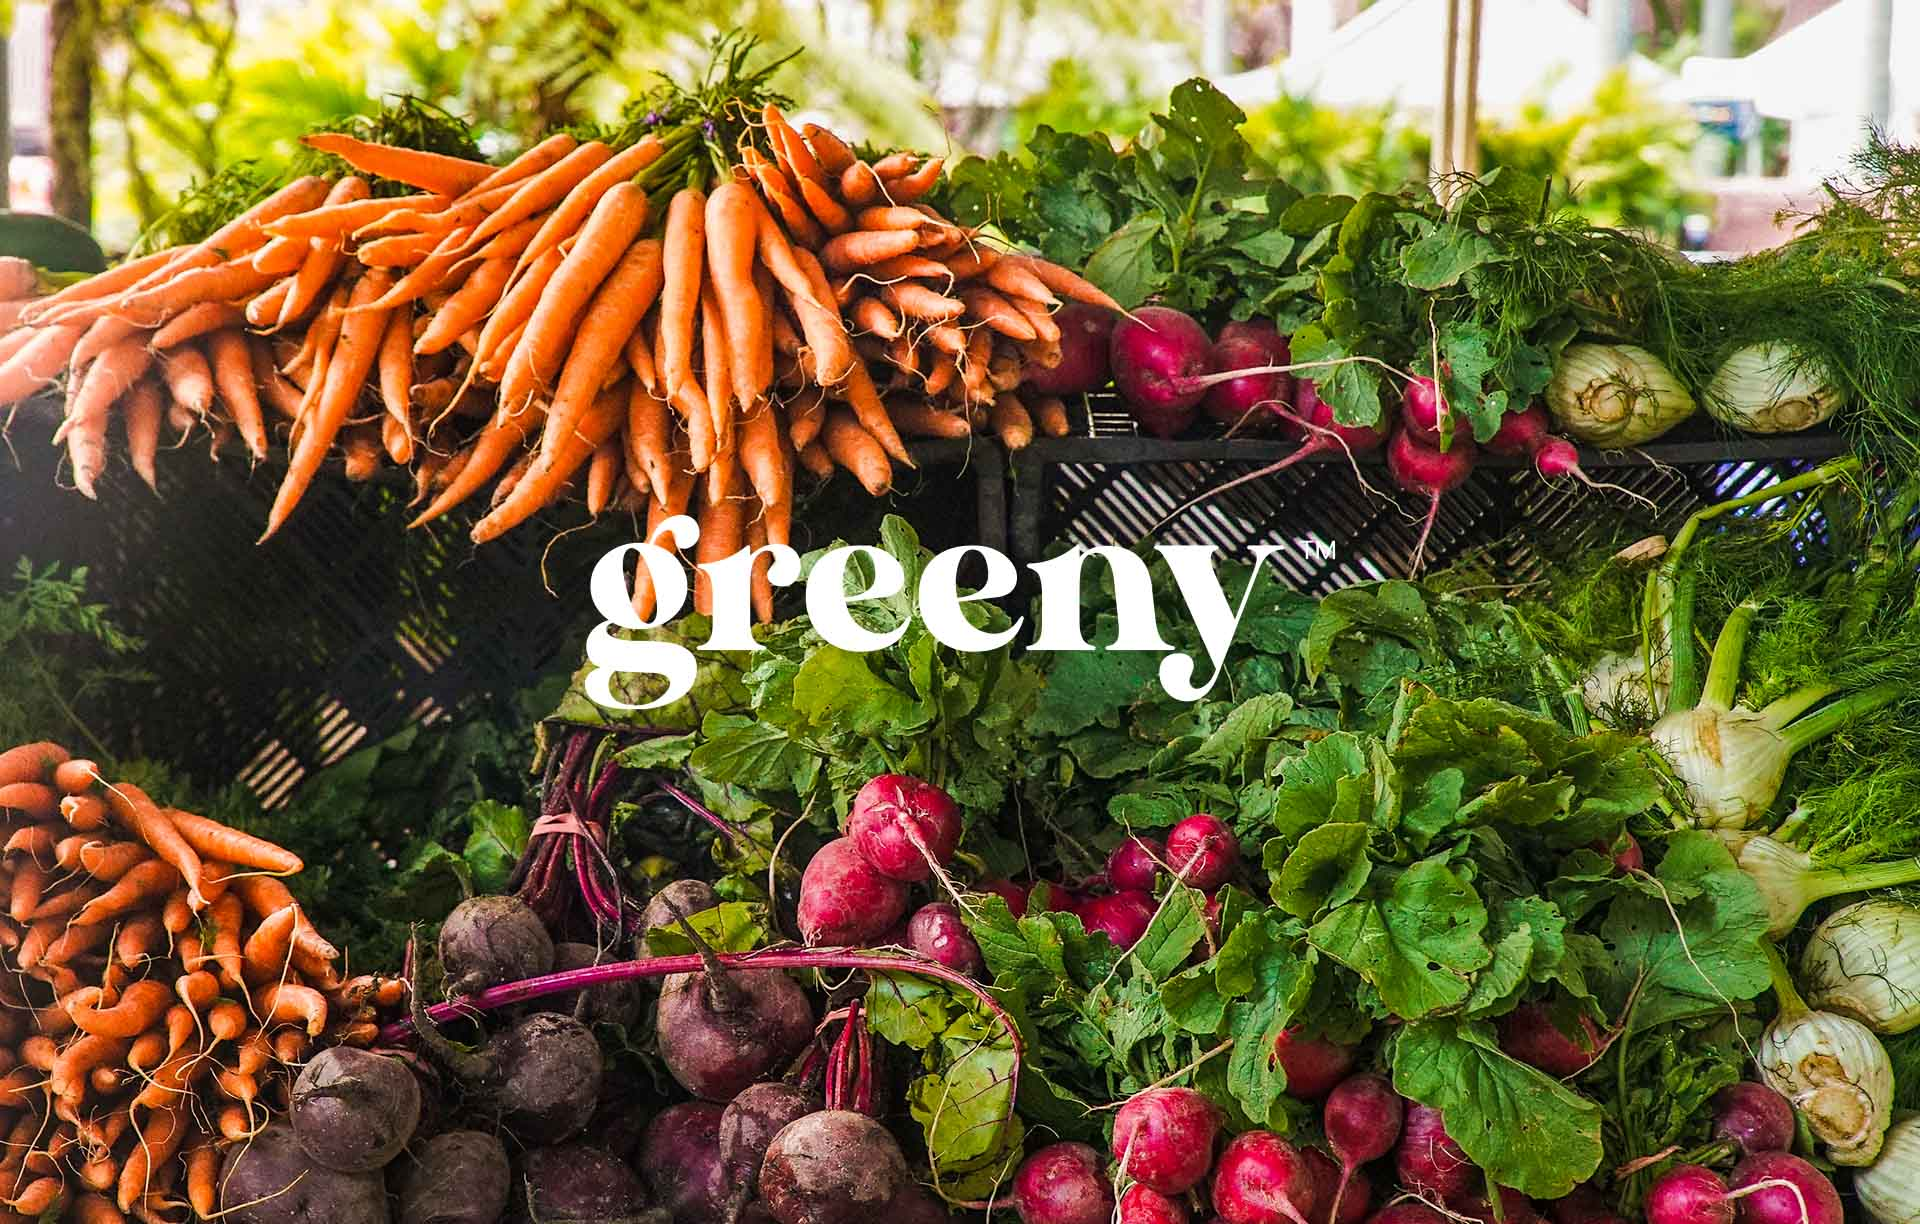 Greeny poster presentation